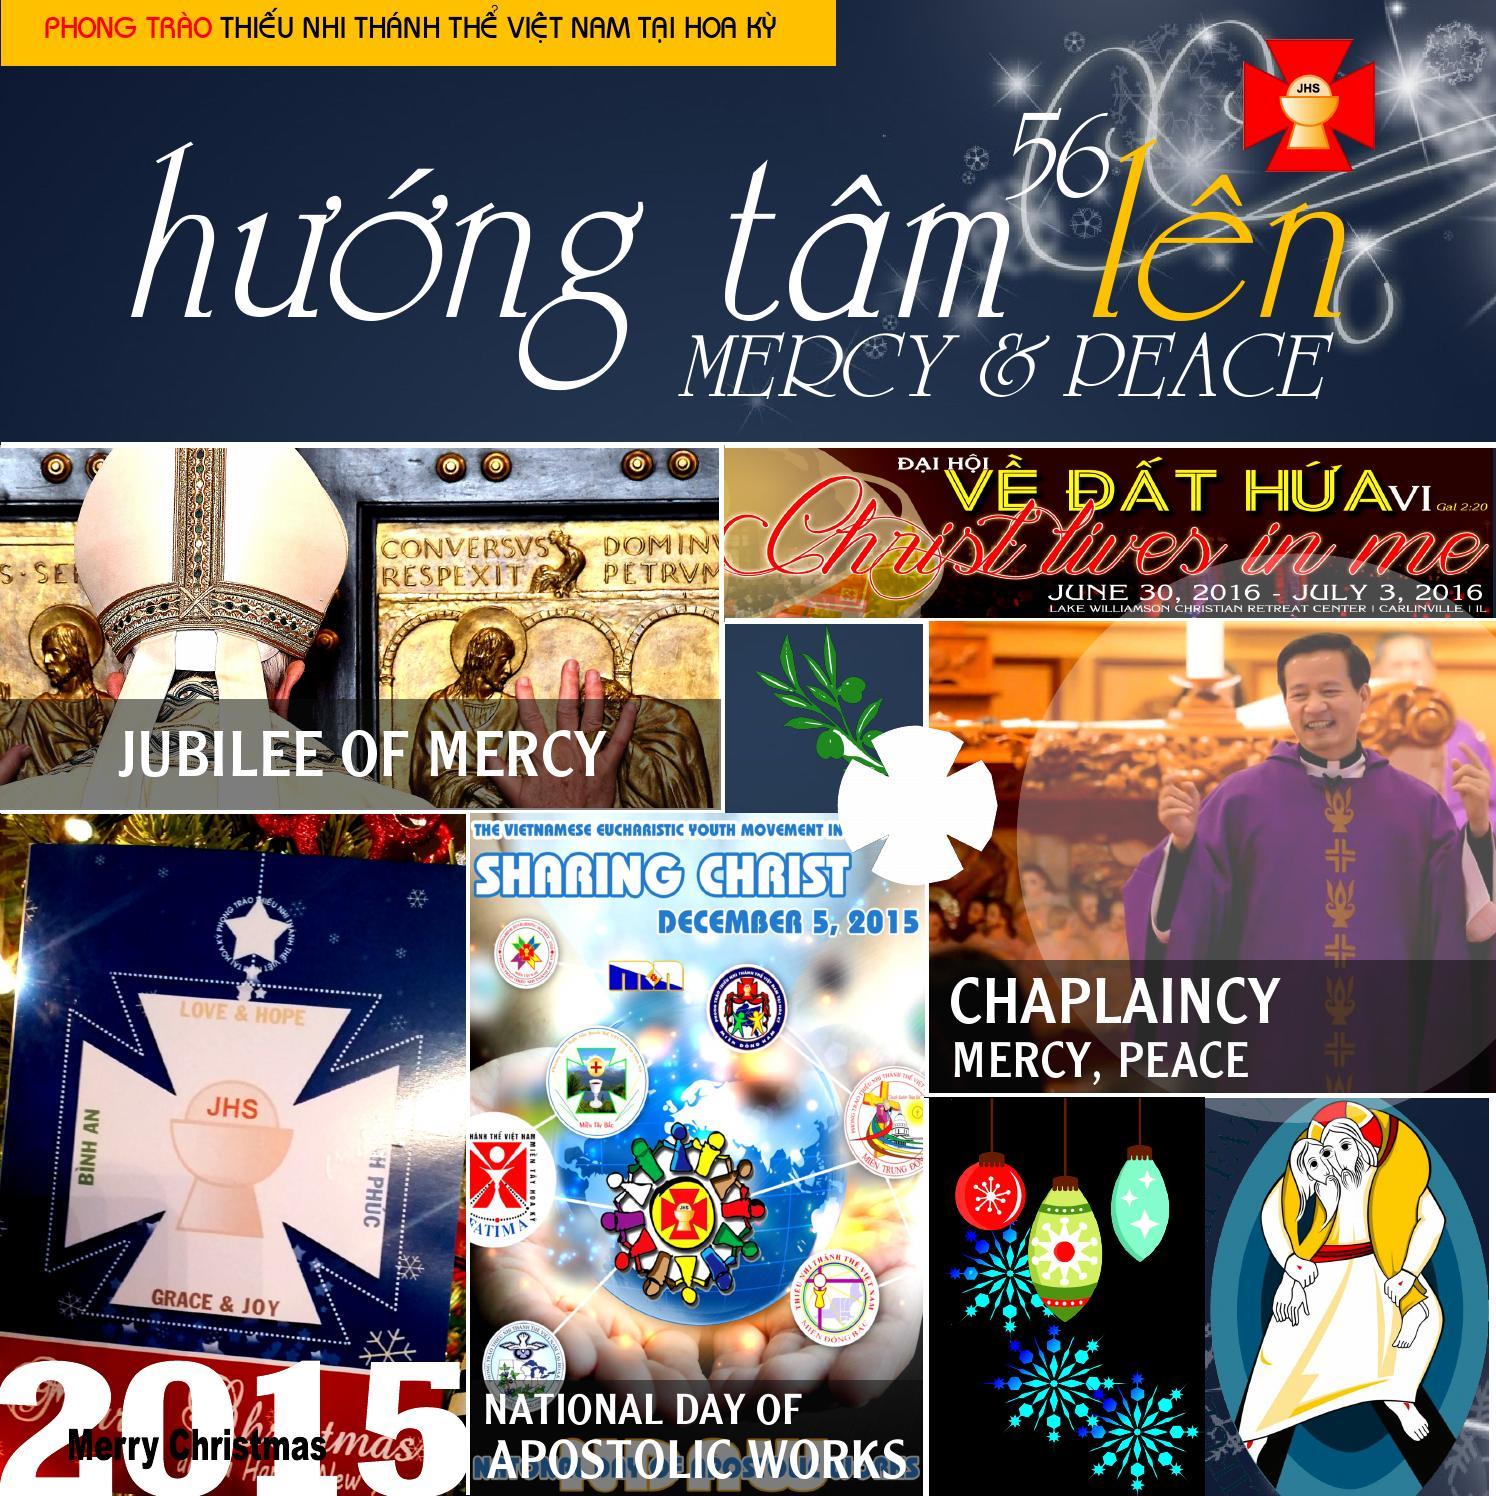 Htl 56 Tntt Mercy Peace By Veym Usa Issuu